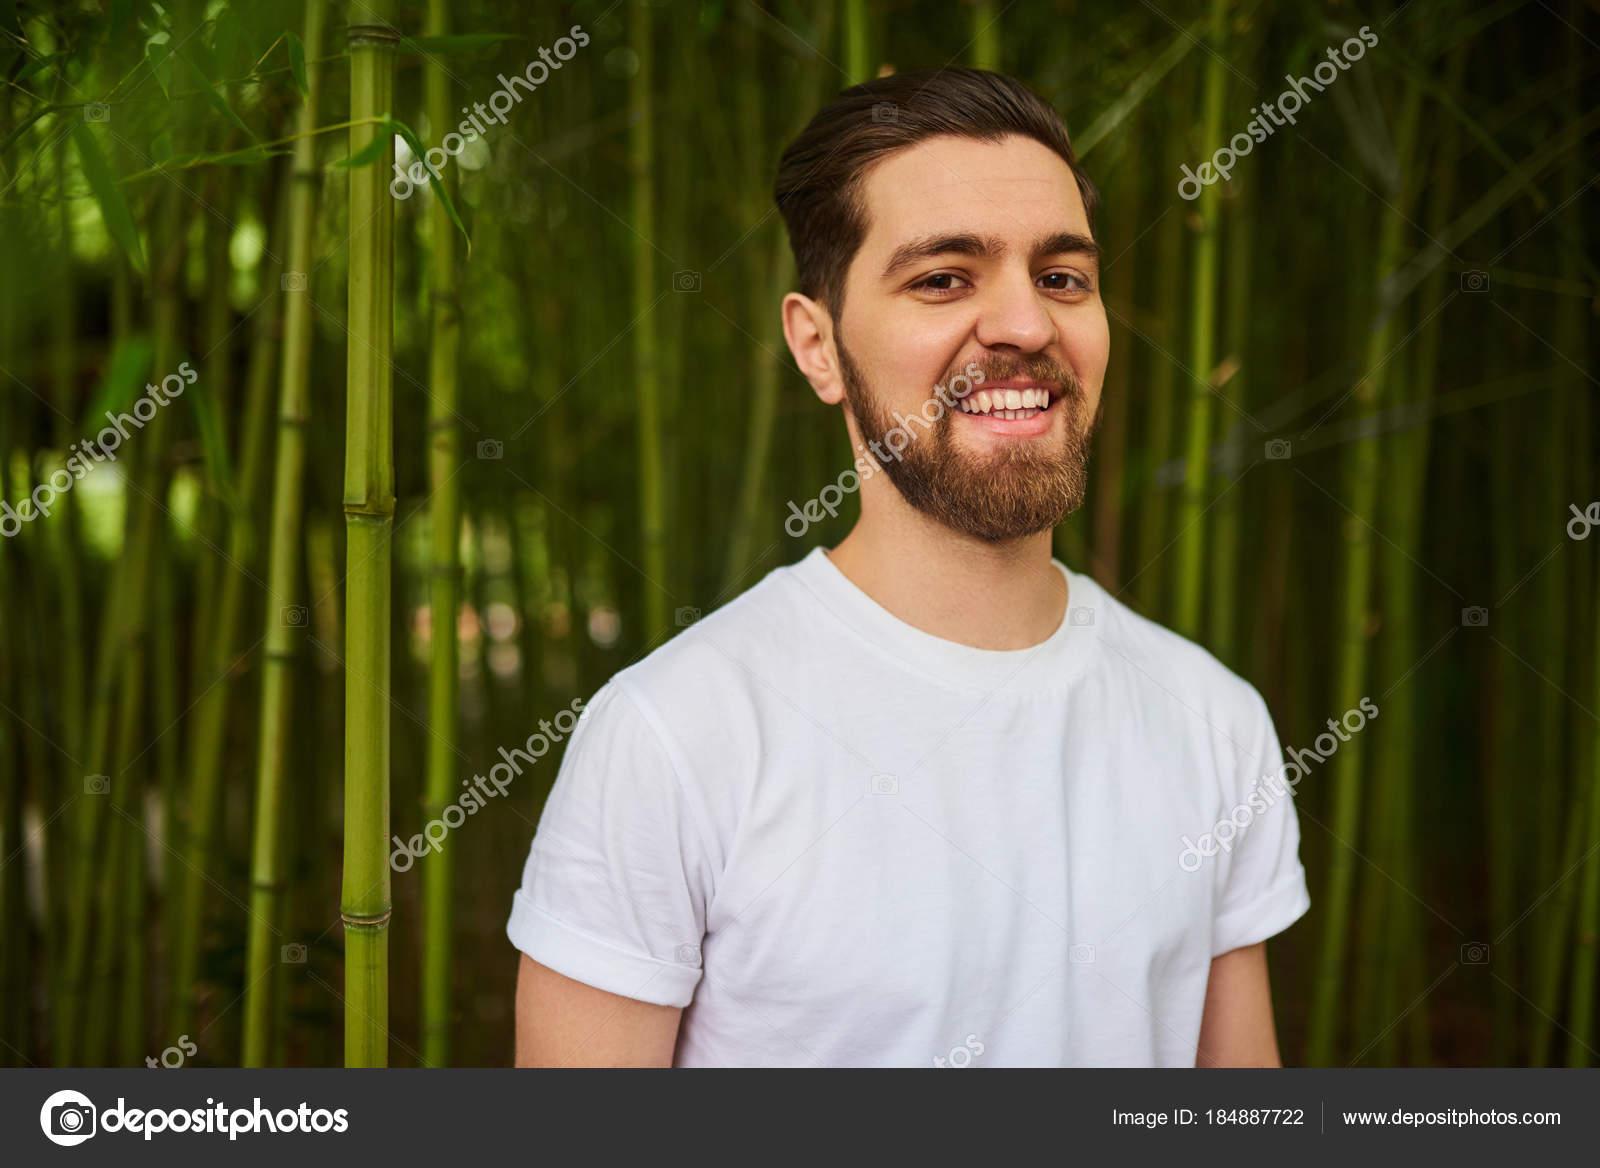 Retrato Sonriente Guapo Barba Hombre Jardín Verde — Foto de stock ... 39b91da68b6